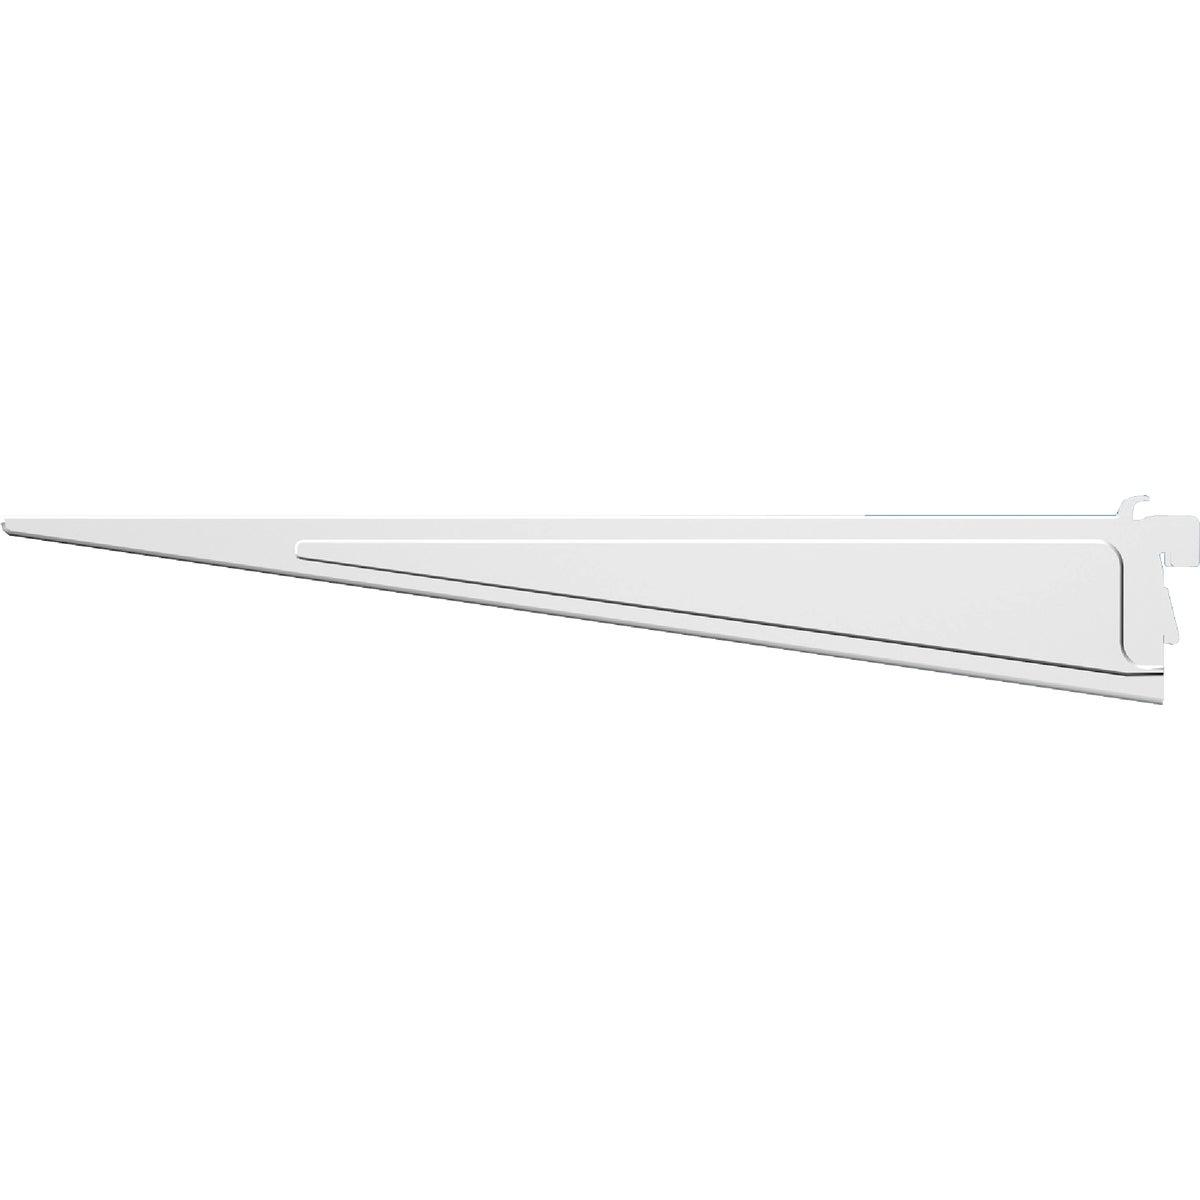 Closetmaid ShelfTrack 16 In. White Shelf Bracket